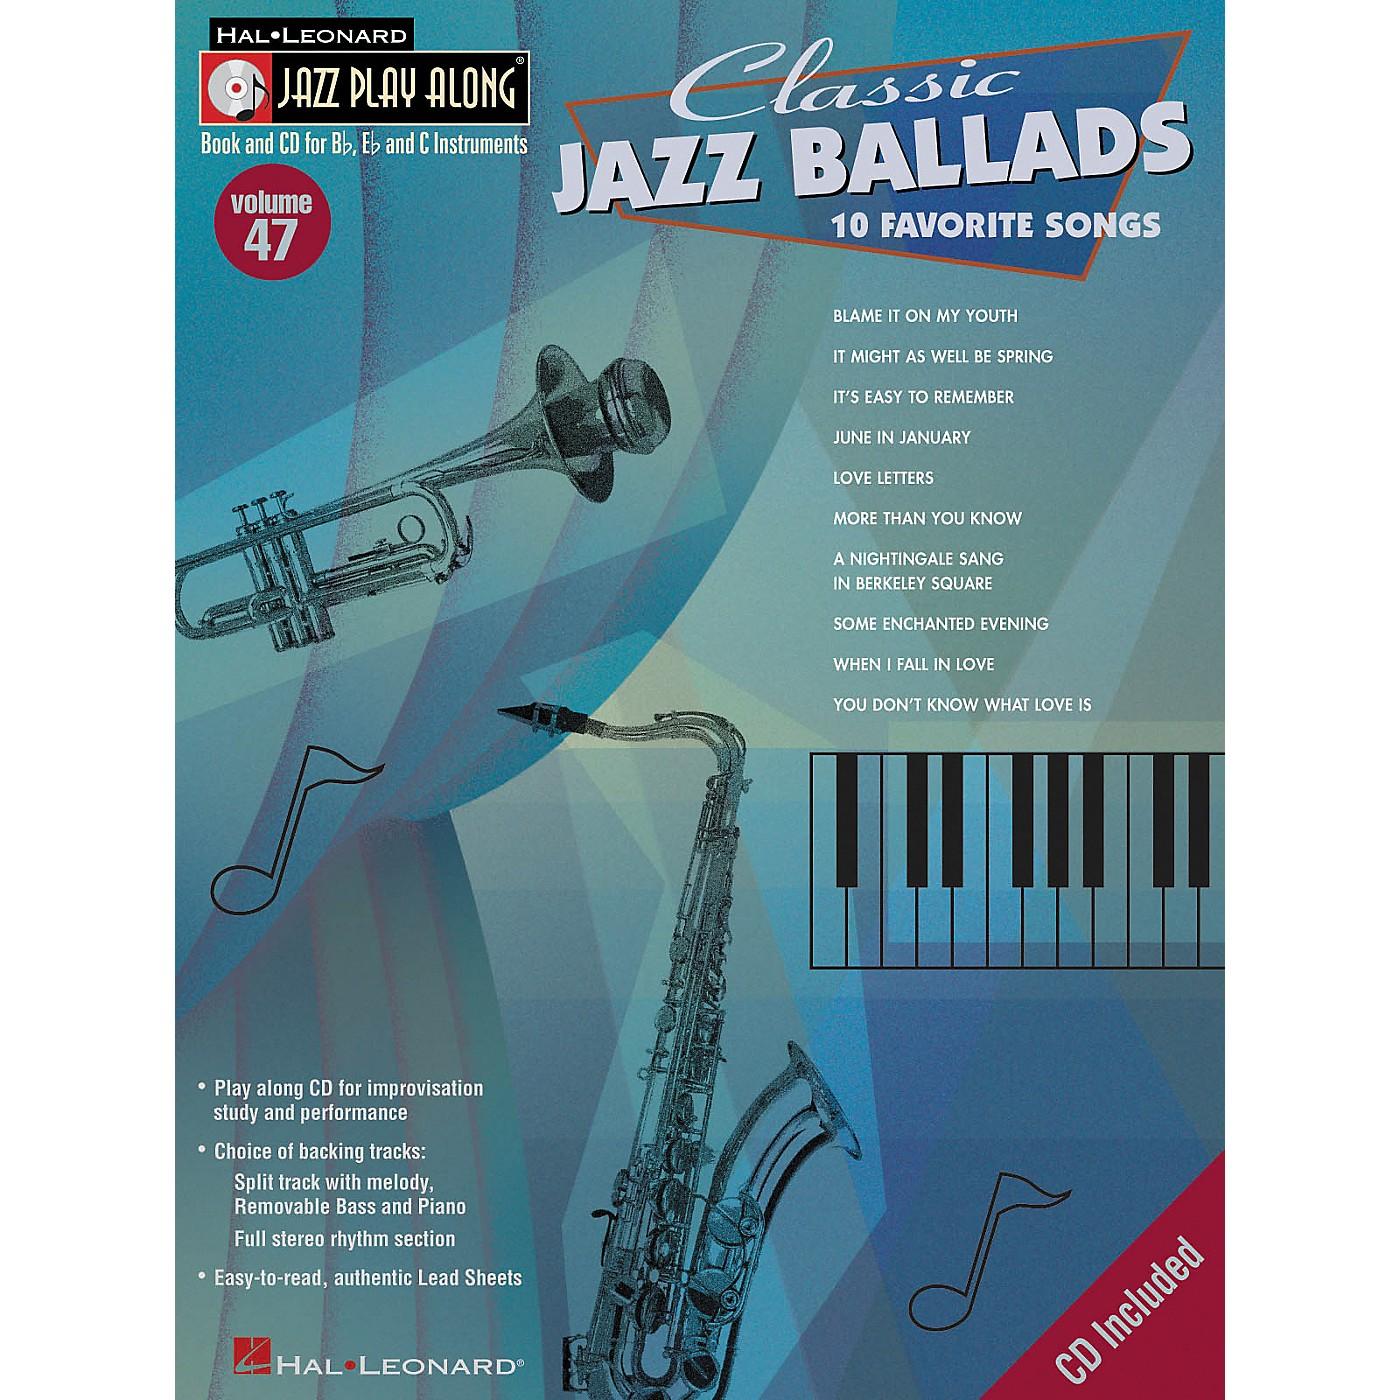 Hal Leonard Classic Jazz Ballads--Jazz Play Along Volume 47 Book with CD thumbnail